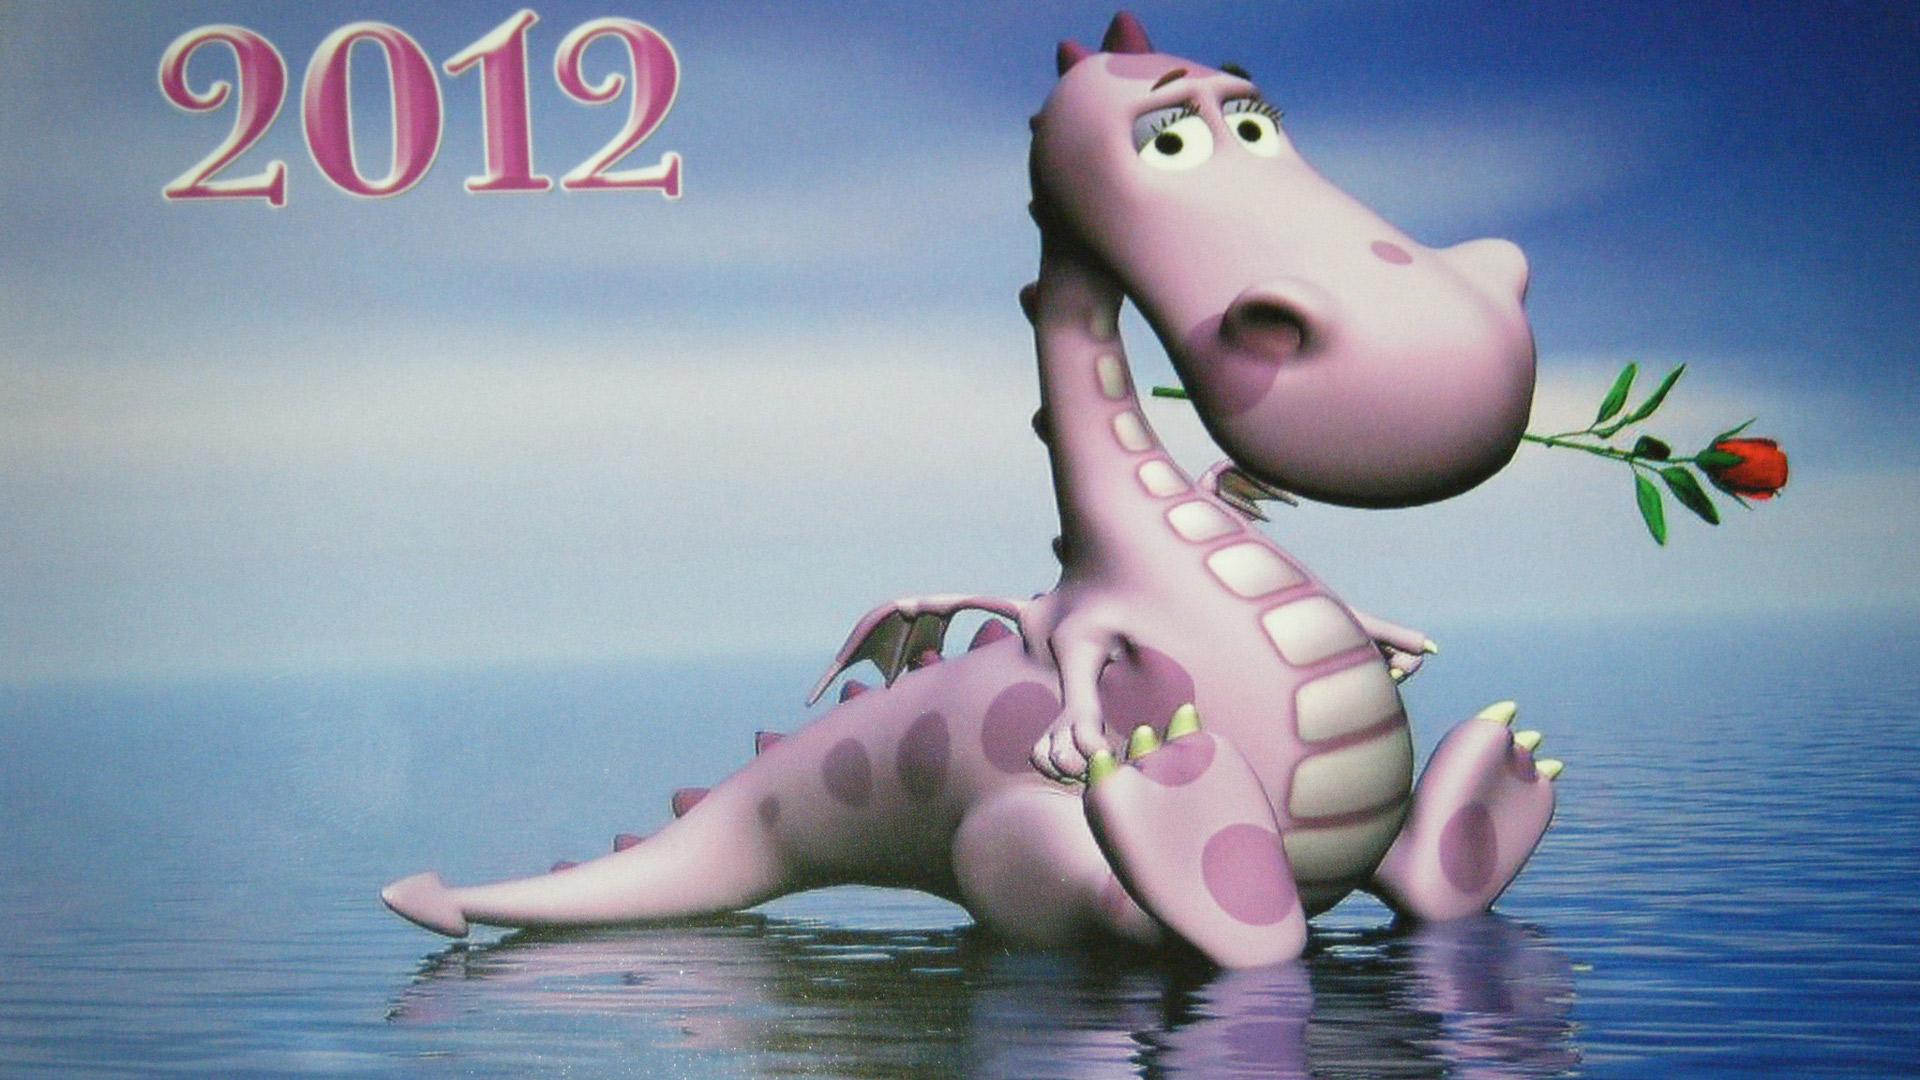 Дракона новый год 2012 new year 2012 2012 2012 год